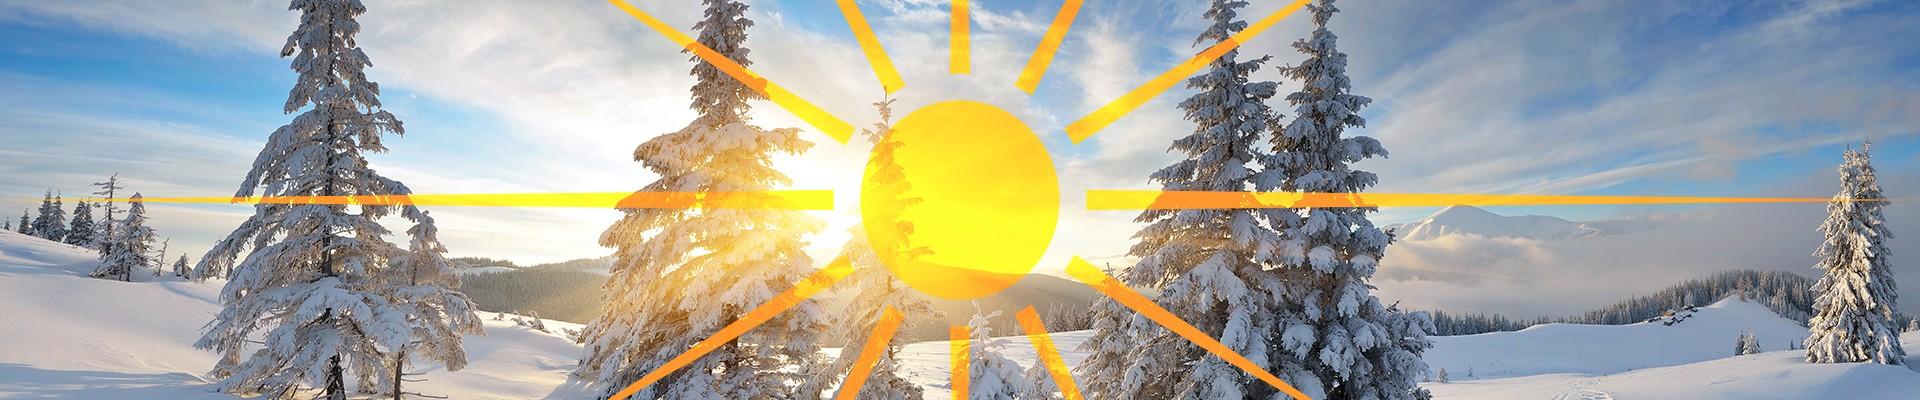 The main our body absorbs vitamin D is through the sun.